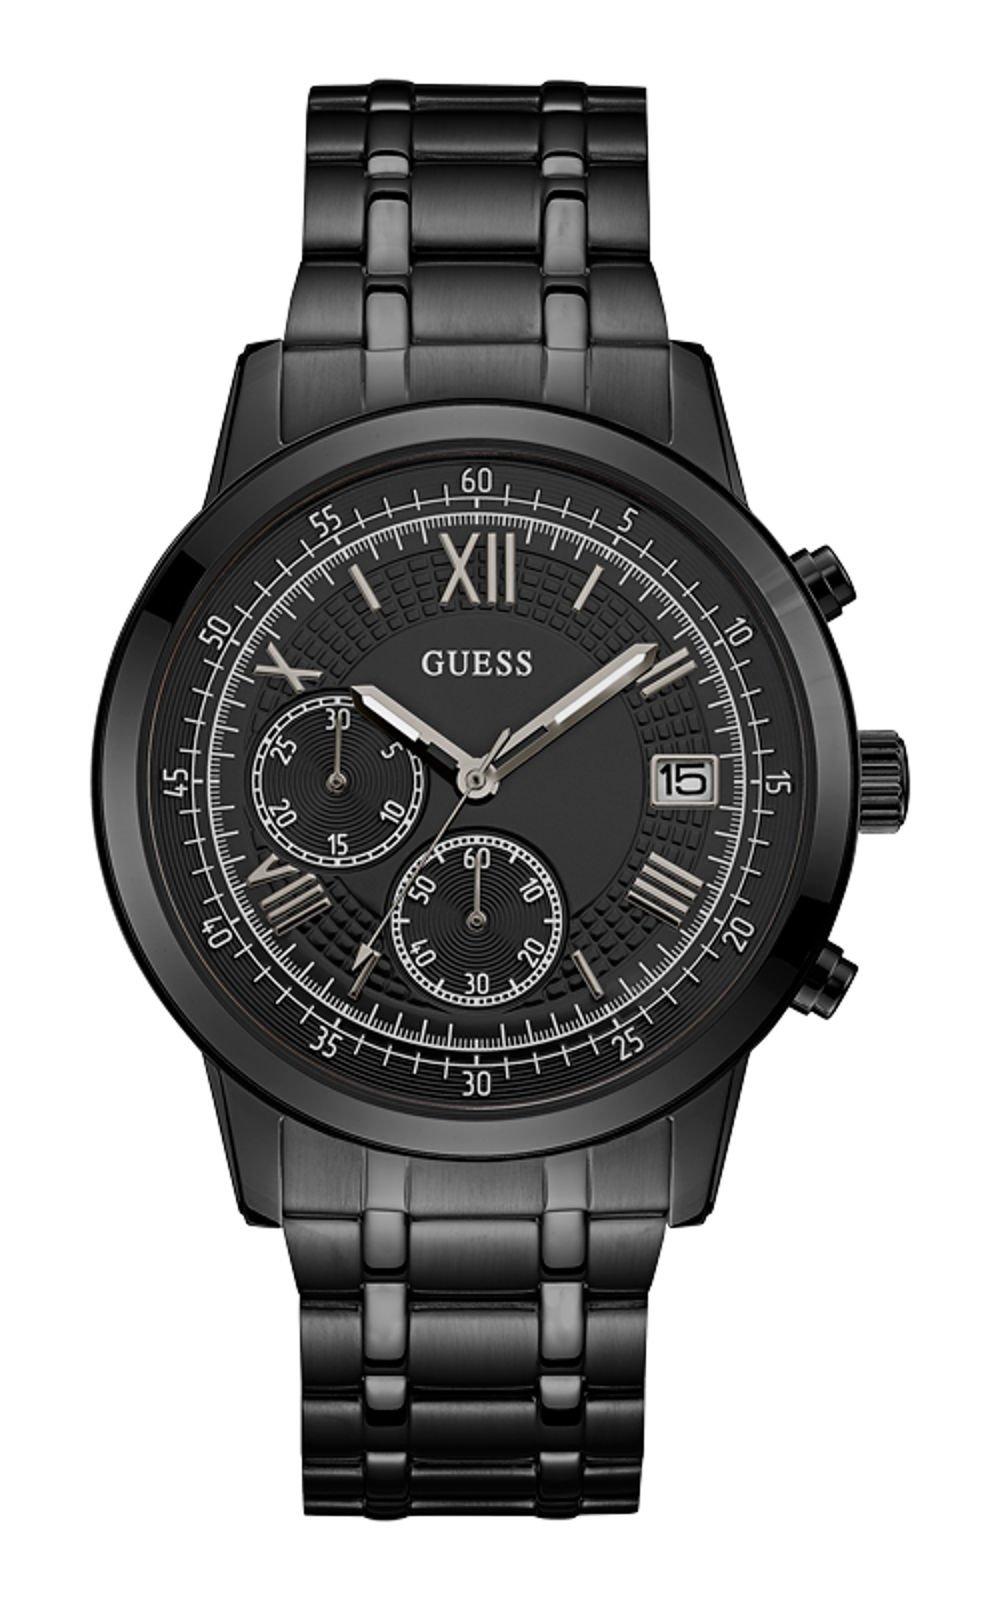 GUESS W1001G3 Ανδρικό Ρολόι Quartz Multi-Function